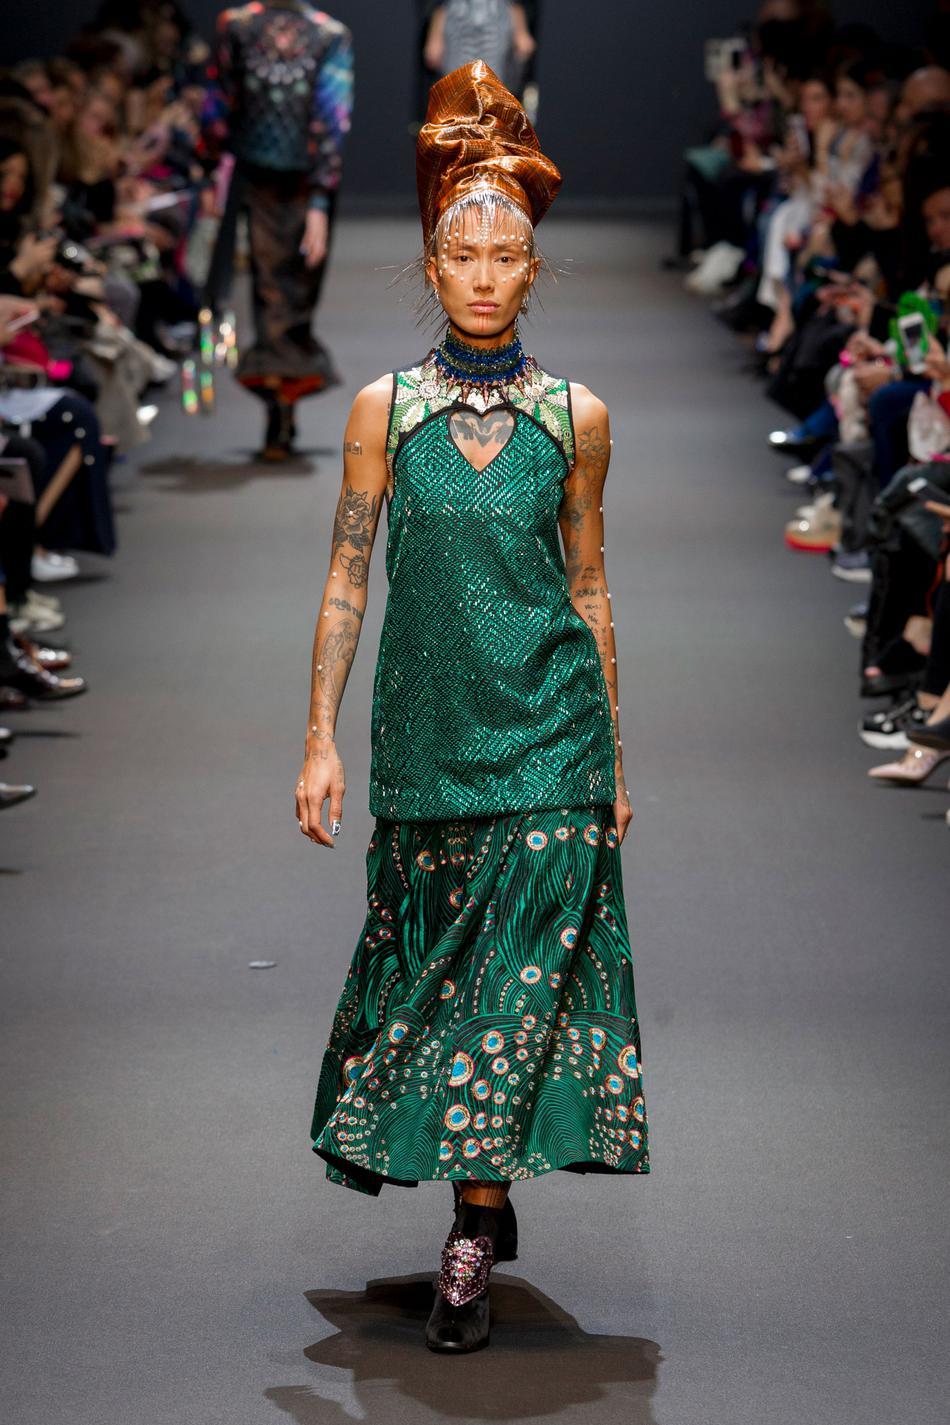 Défilé Manish Arora Fashion Week 2017 - Look 22